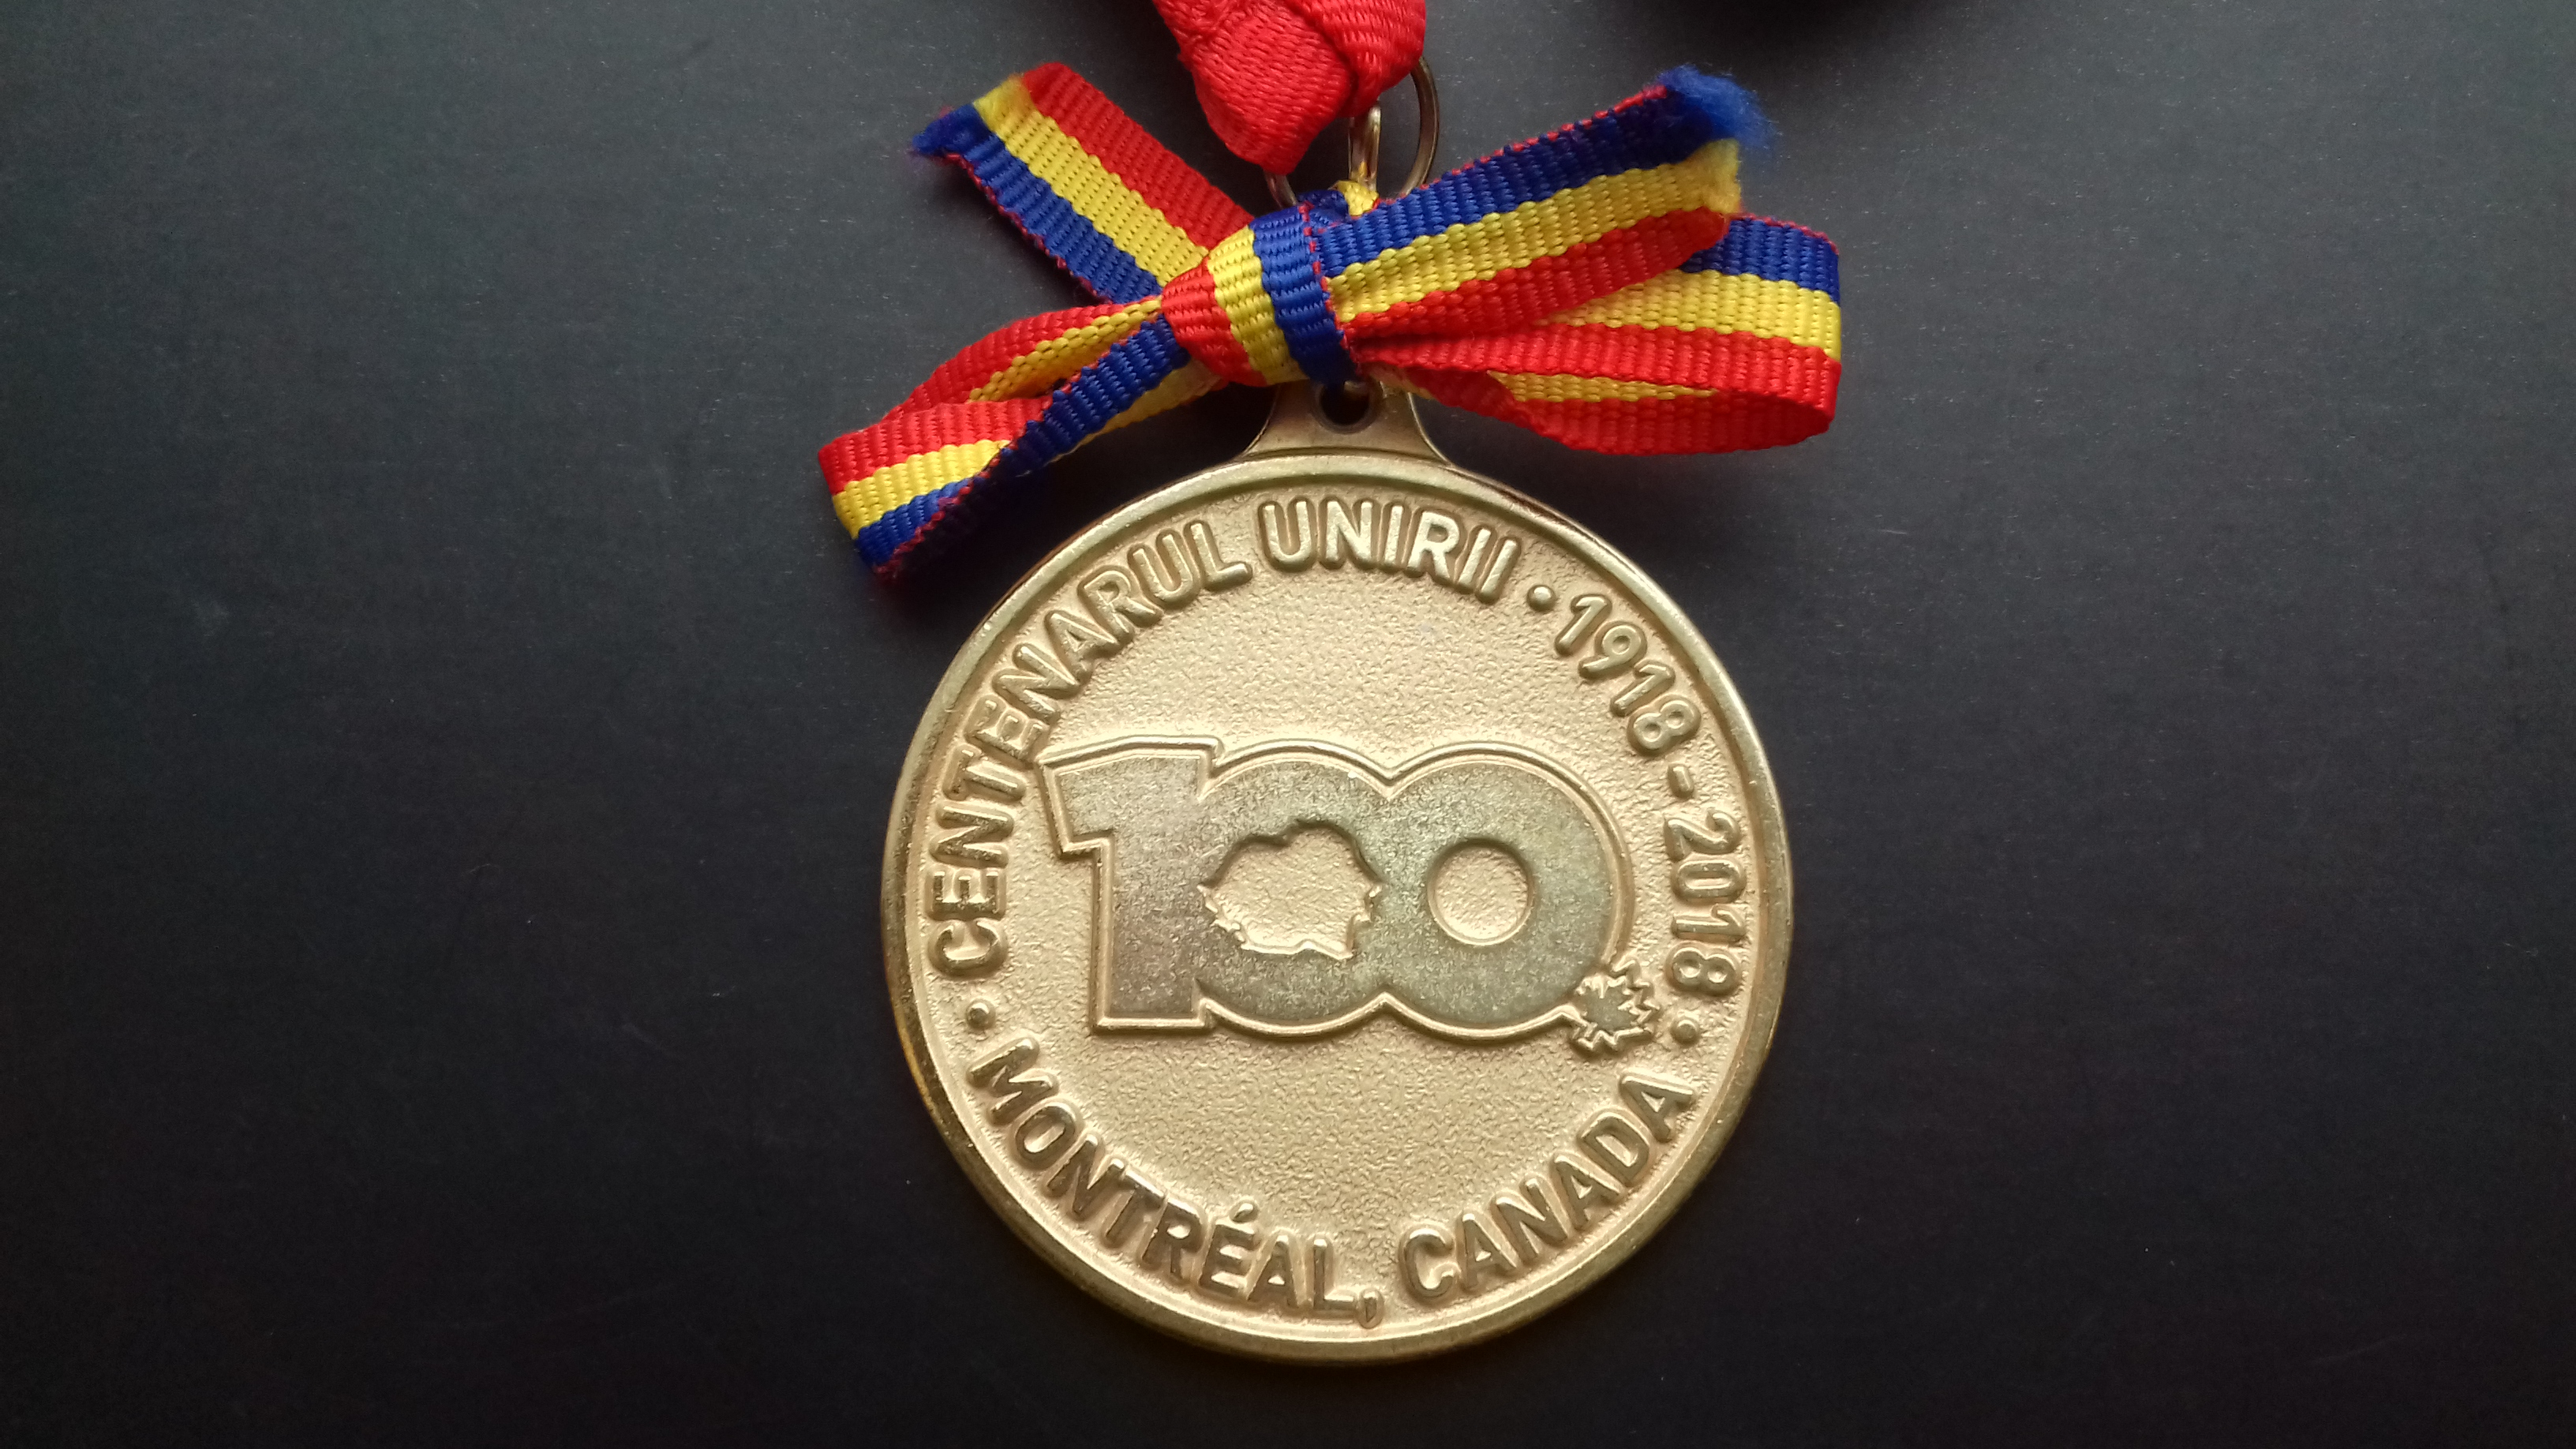 32-medalia-centenarul-unirii-montreal-canada-decernata-1-dec-2018